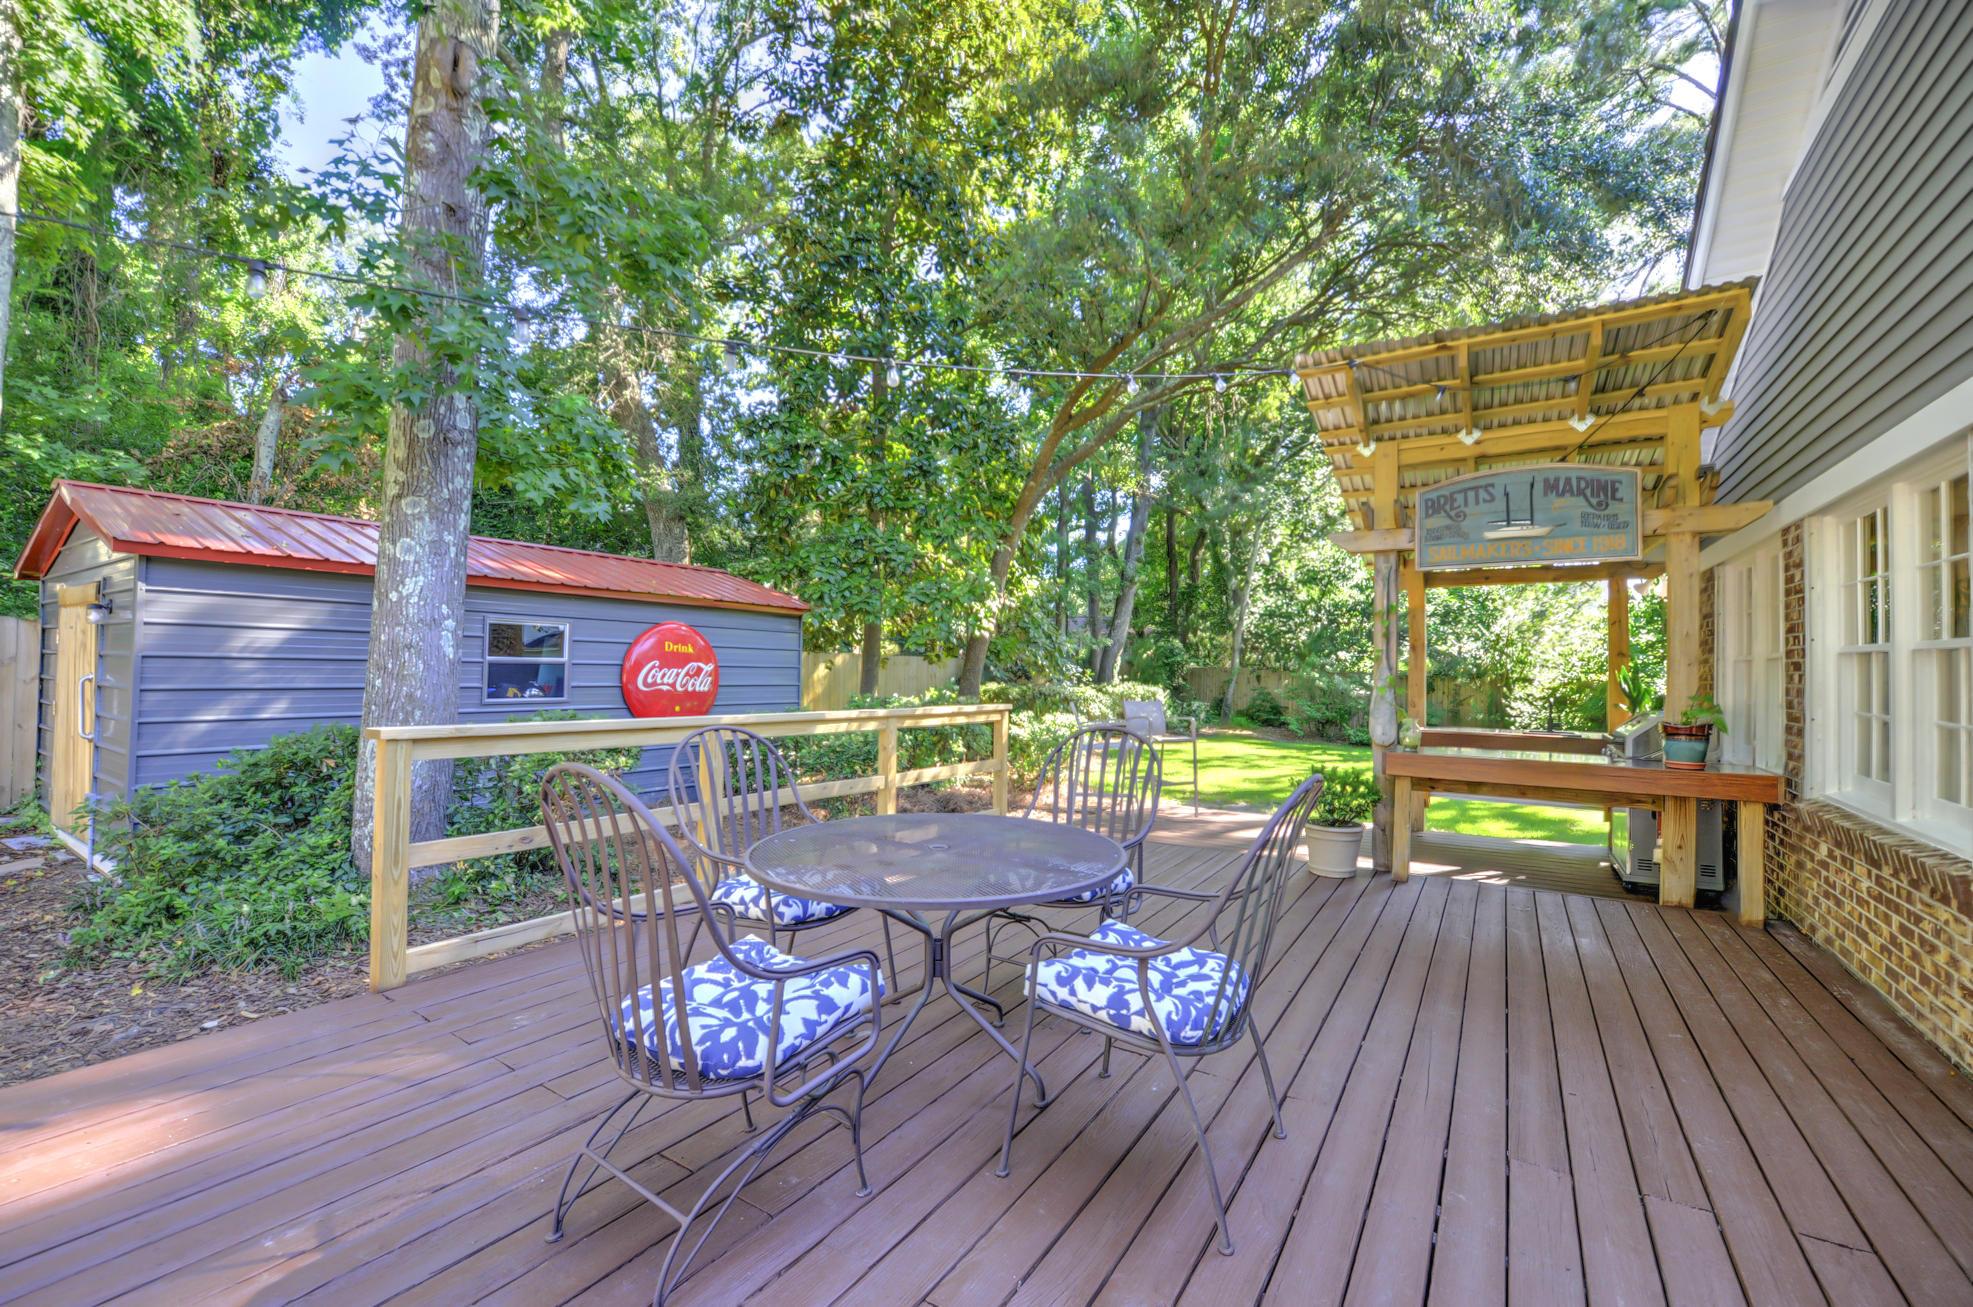 Shemwood II Homes For Sale - 1017 Jack Snipe, Mount Pleasant, SC - 40